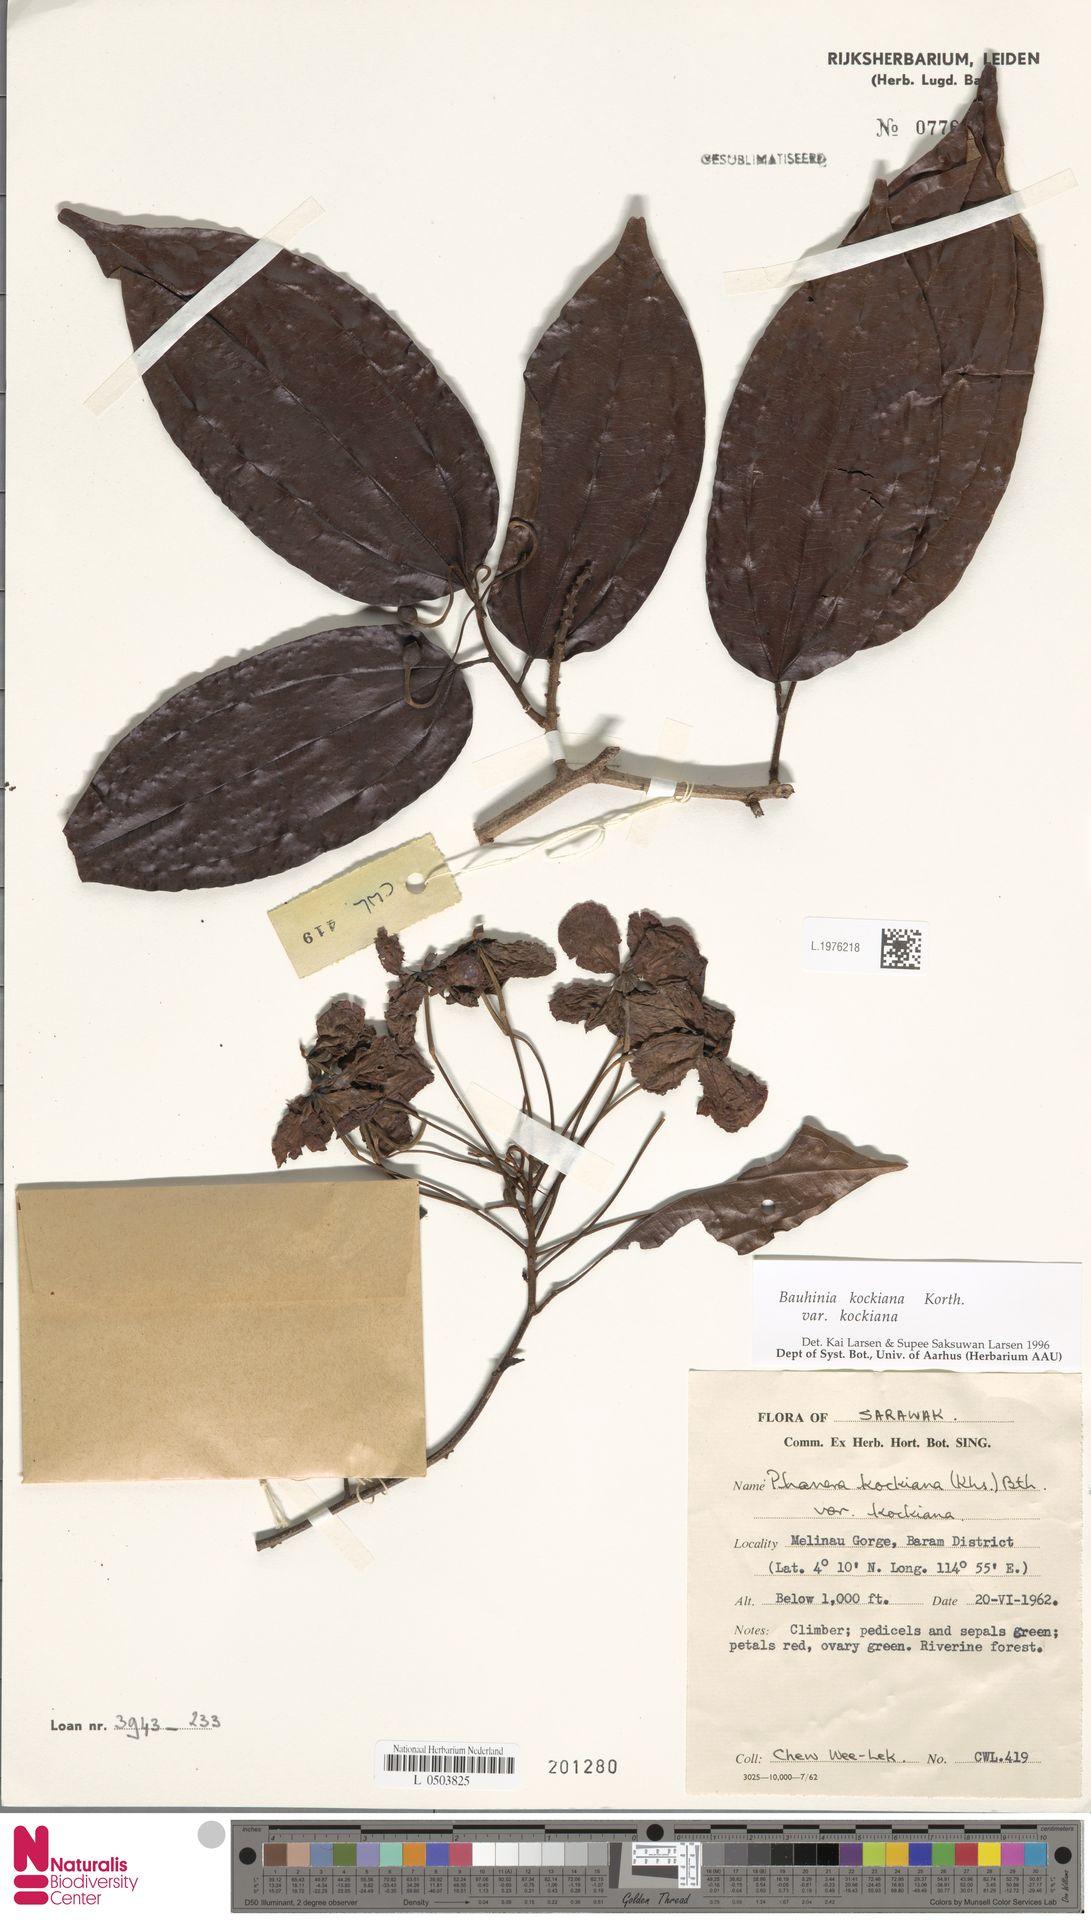 L.1976218   Bauhinia kockiana var. kockiana